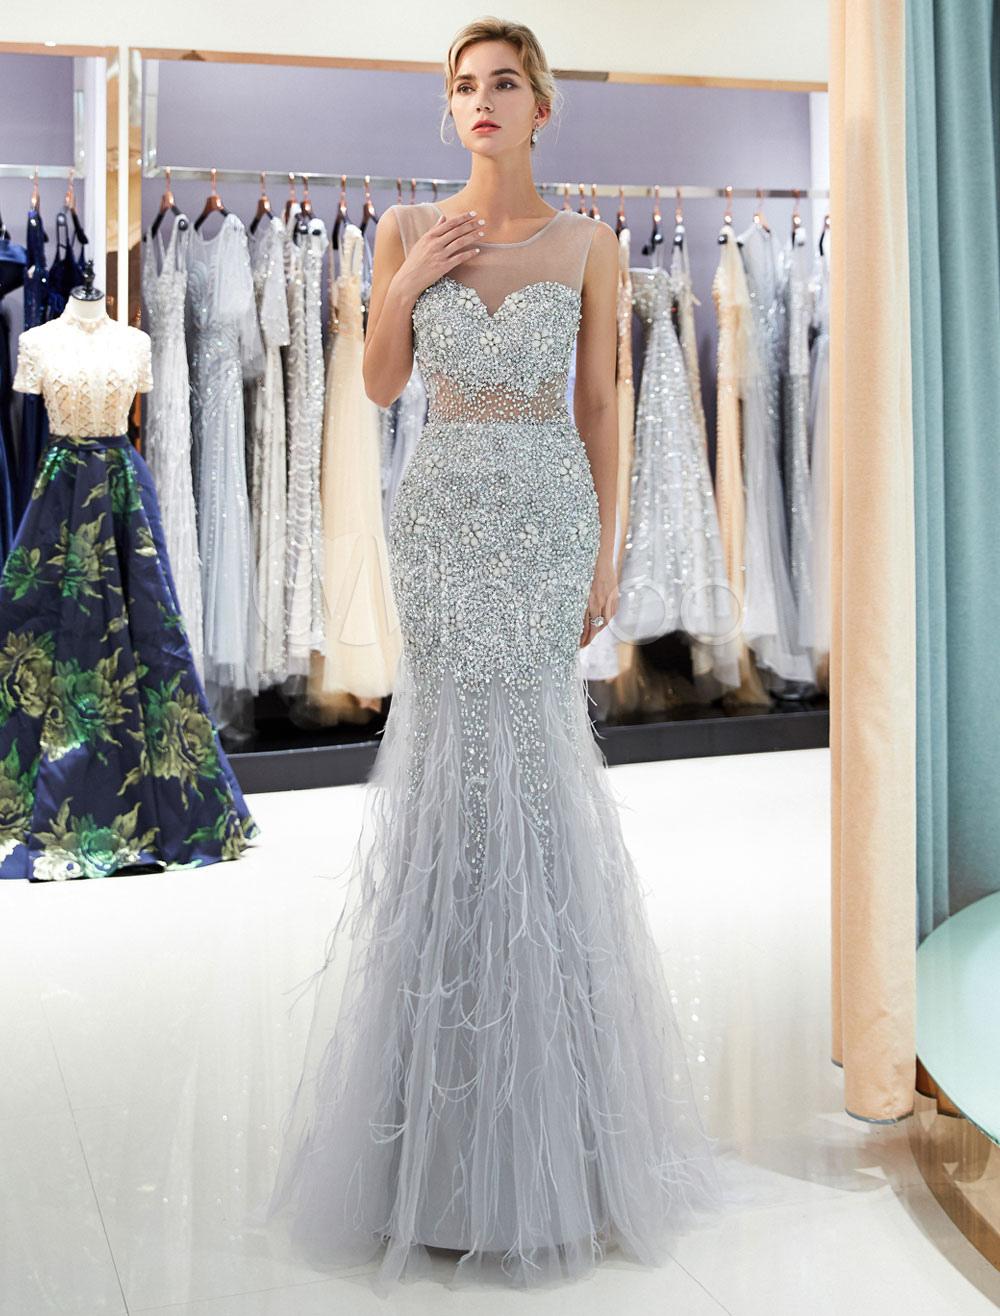 e452f0240055 Luxury Prom Dresses Light Grey Sequin Beading Illusion Sleeveless ...